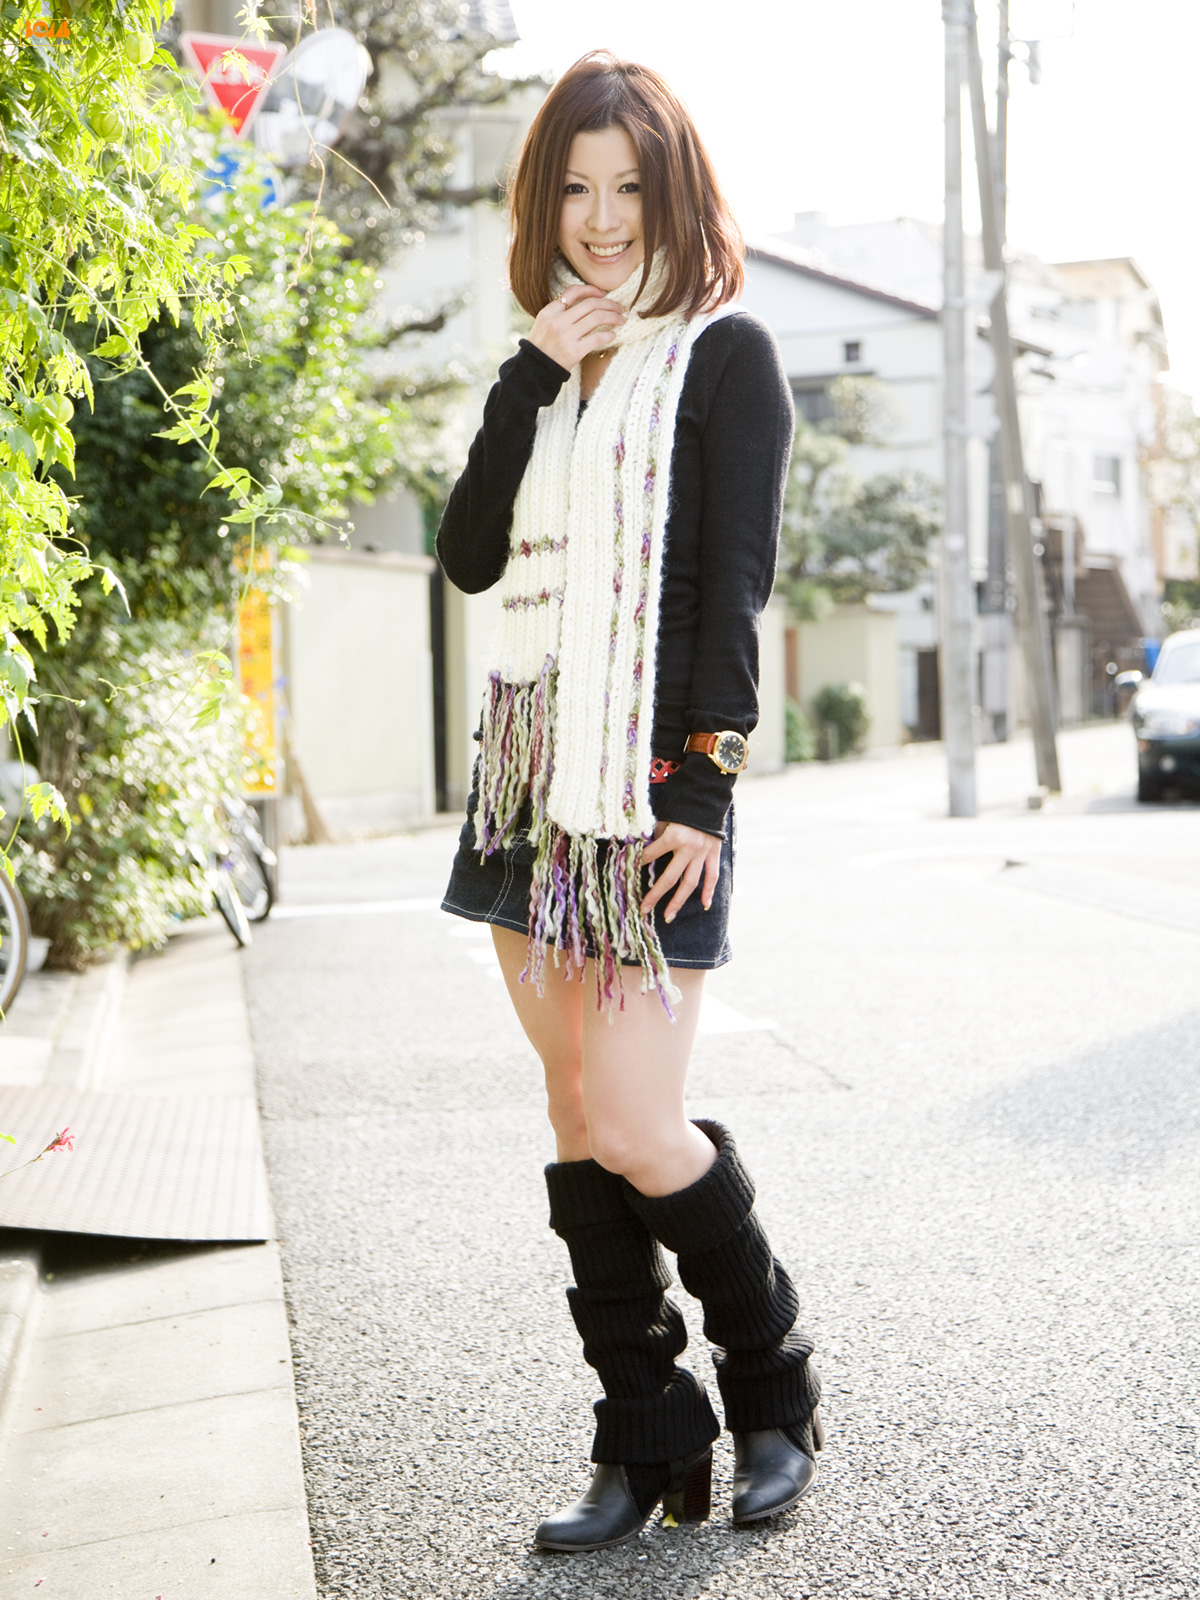 Akiko Hayashi - Bomb.tv 林亜紀子 ~ ぜったい☆才色主義 - idols